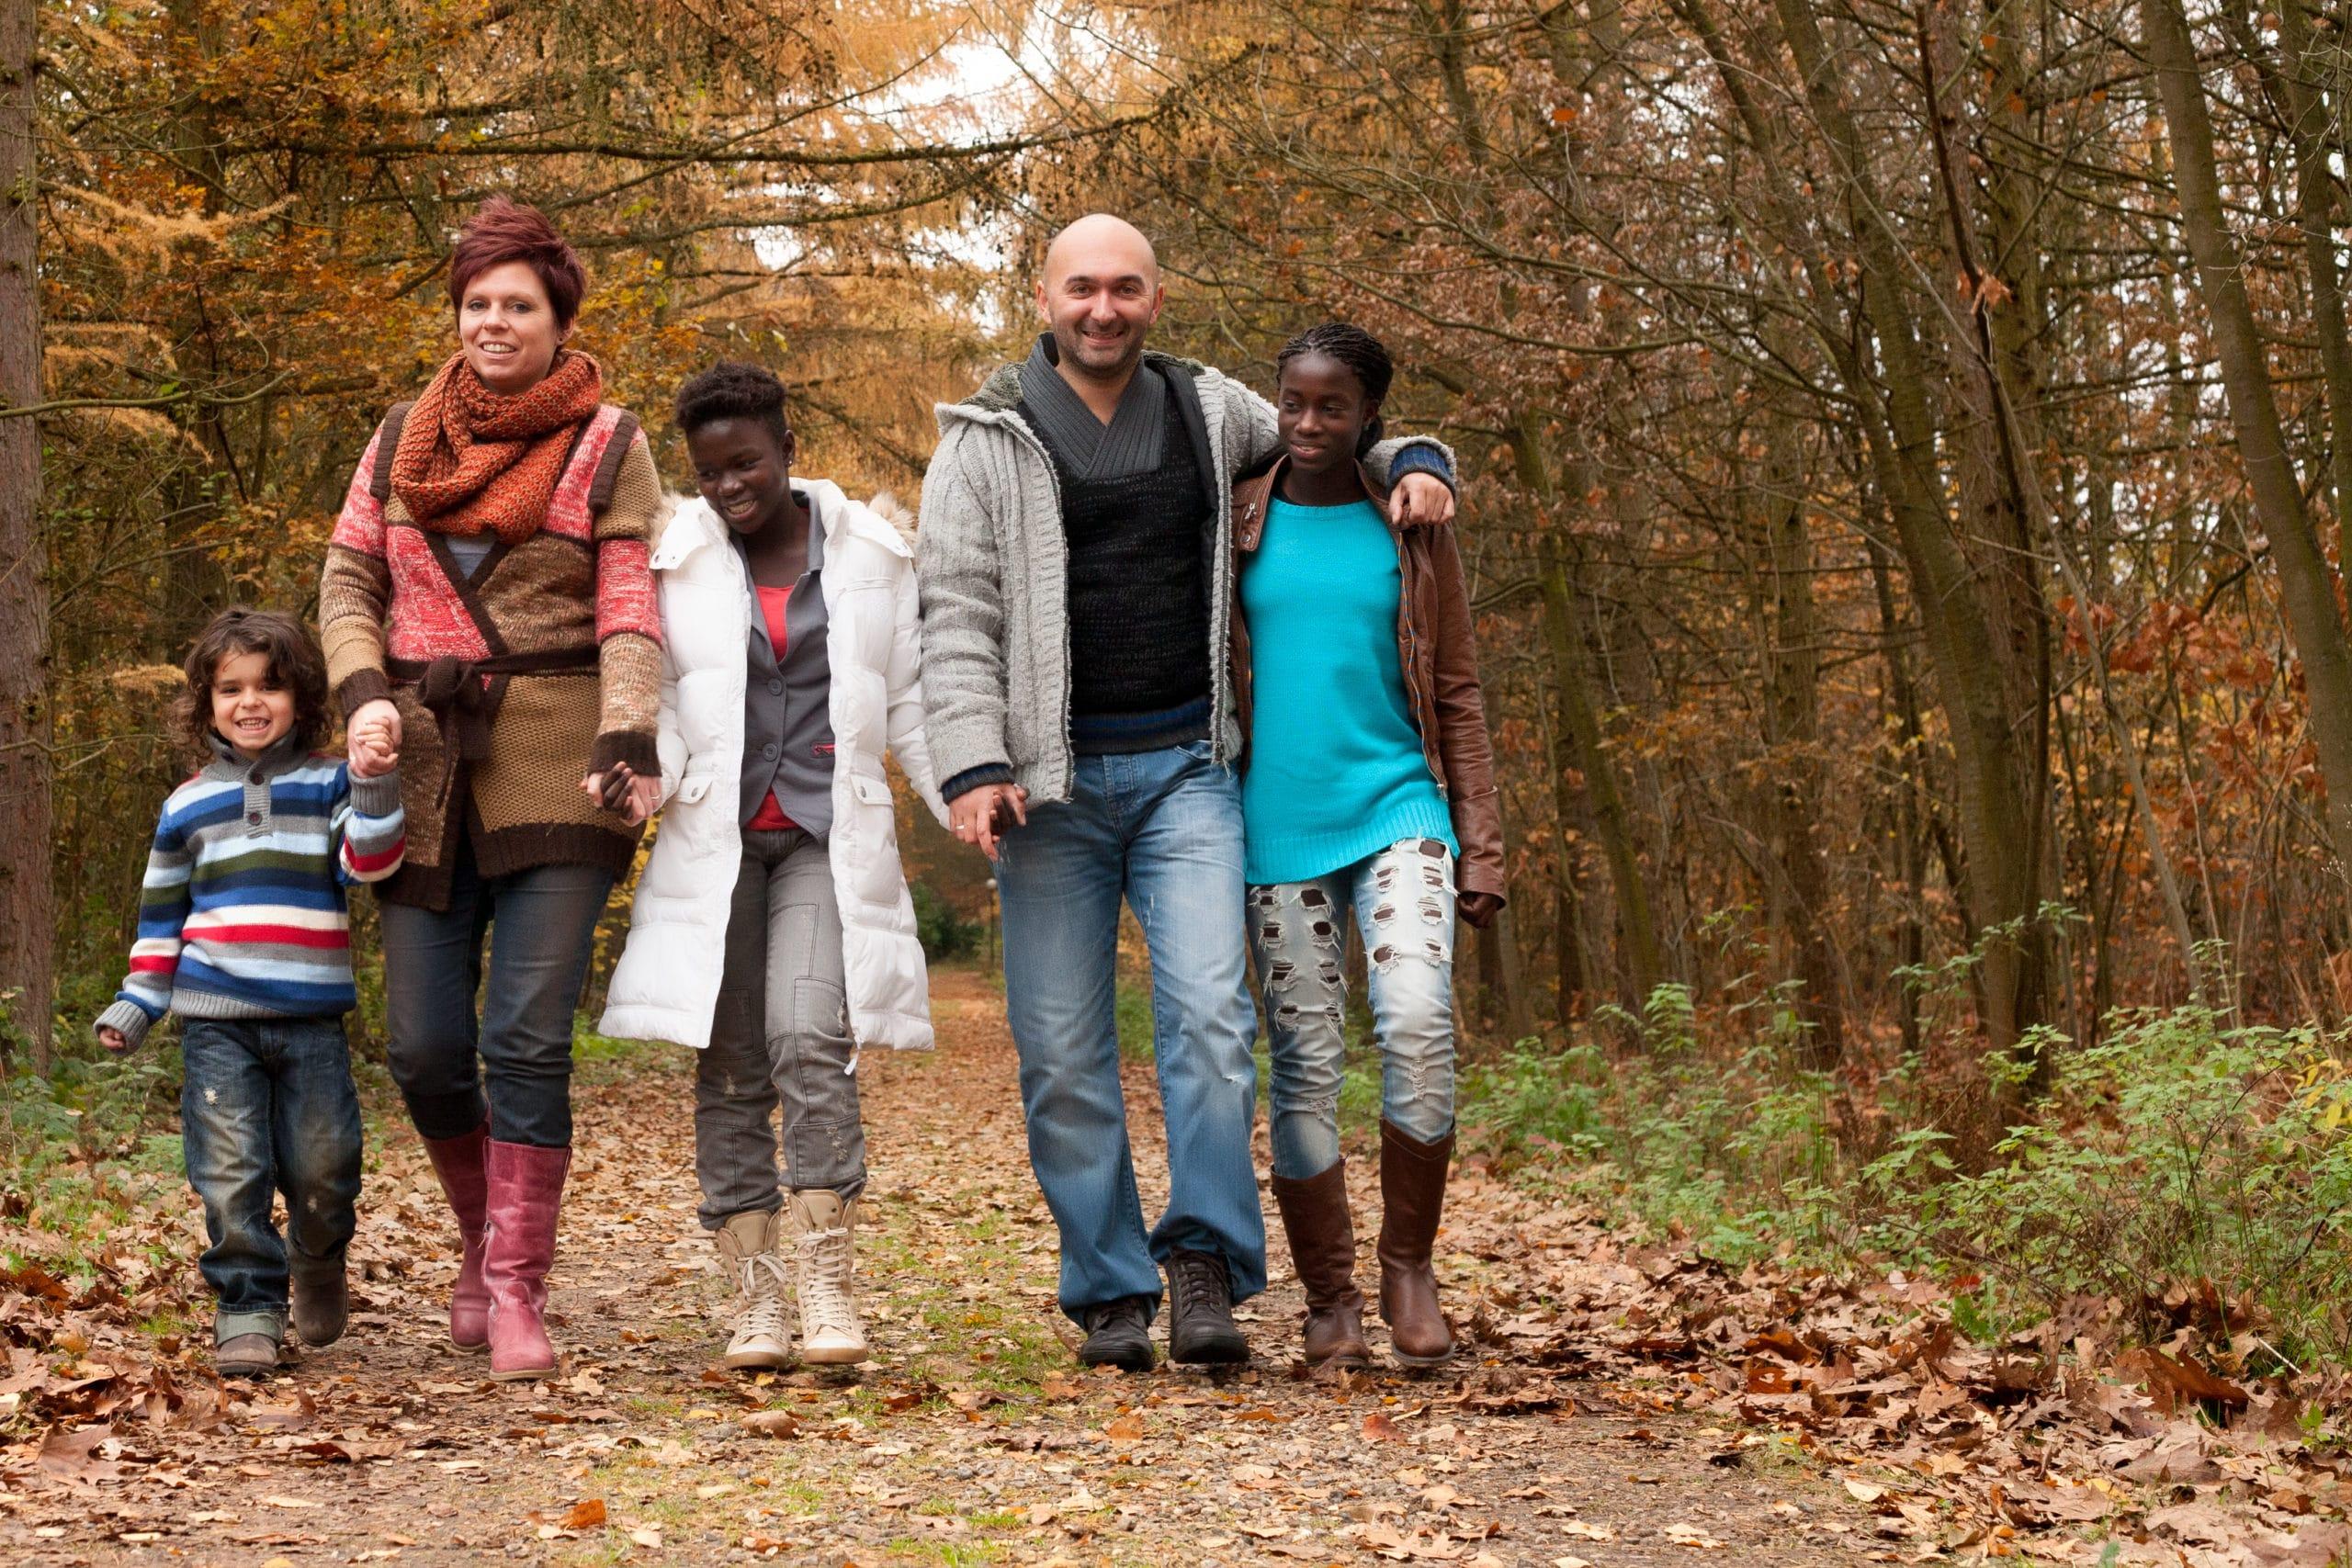 shutterstock 123381382 - Common Sense Parenting